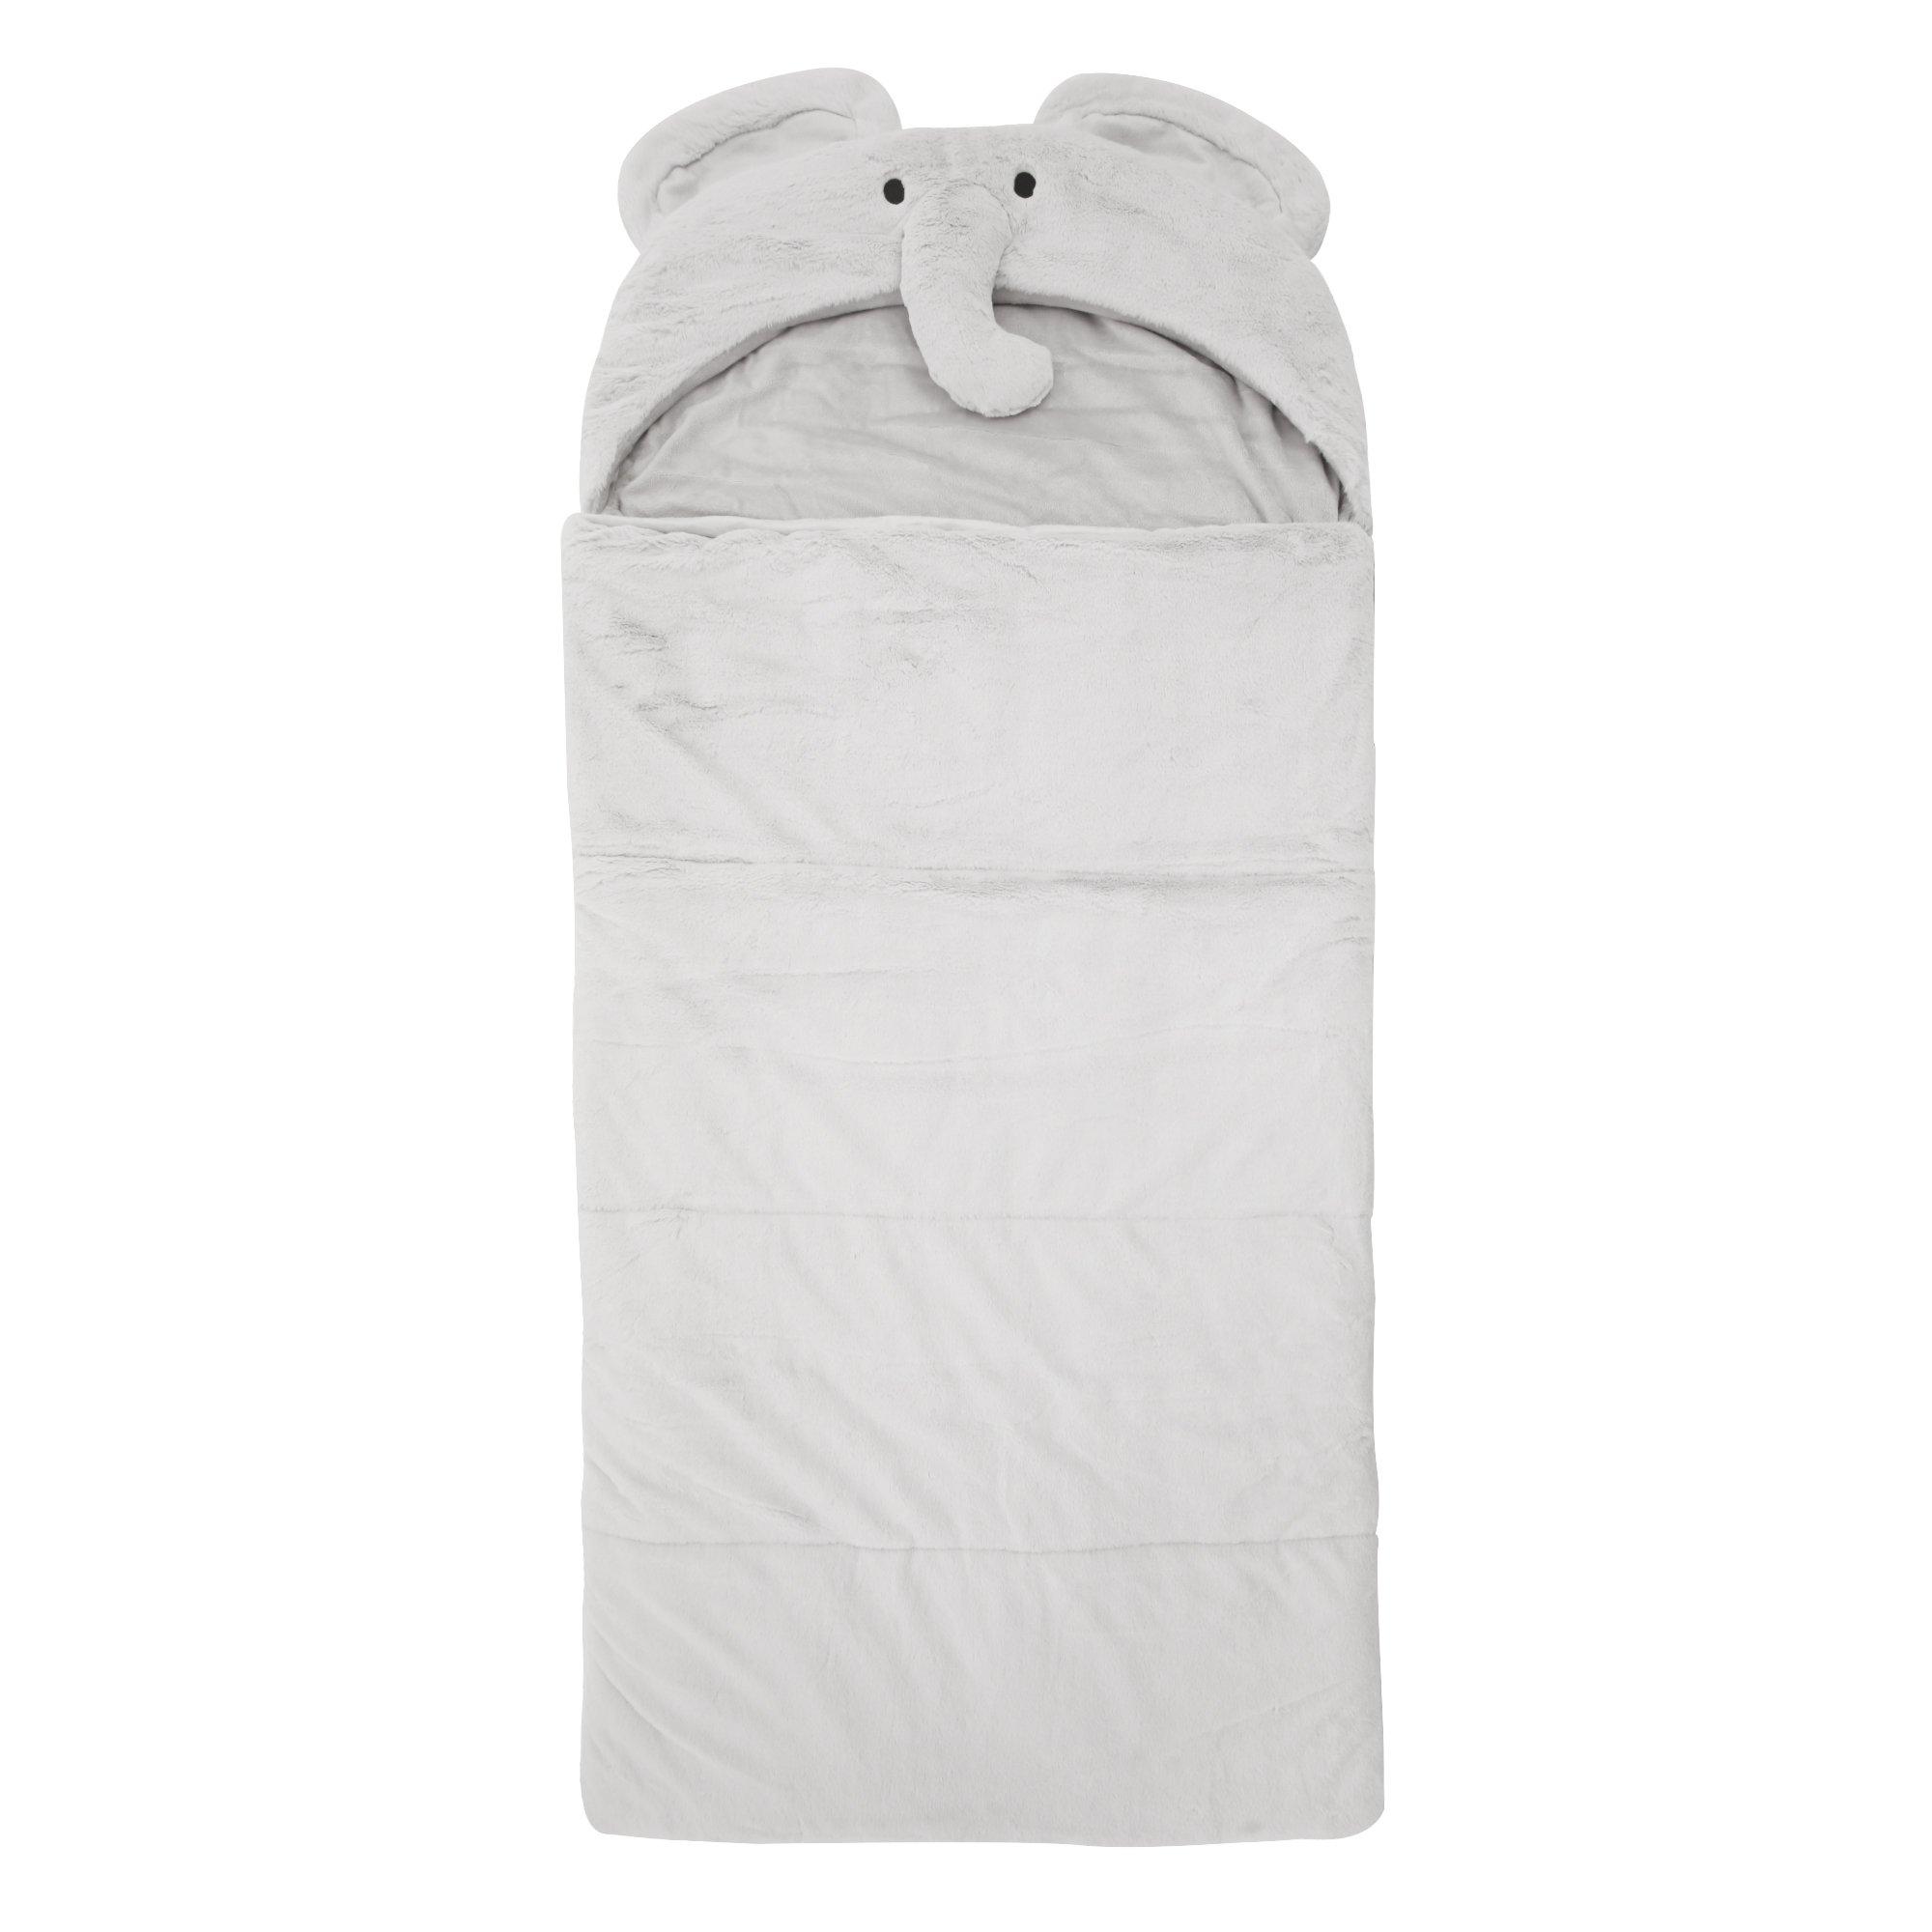 Best Home Fashion Plush Faux Fur Hooded Elephant Animal Sleeping Bag - Grey - 27''W x 59''L - (1 Sleeping Bag)